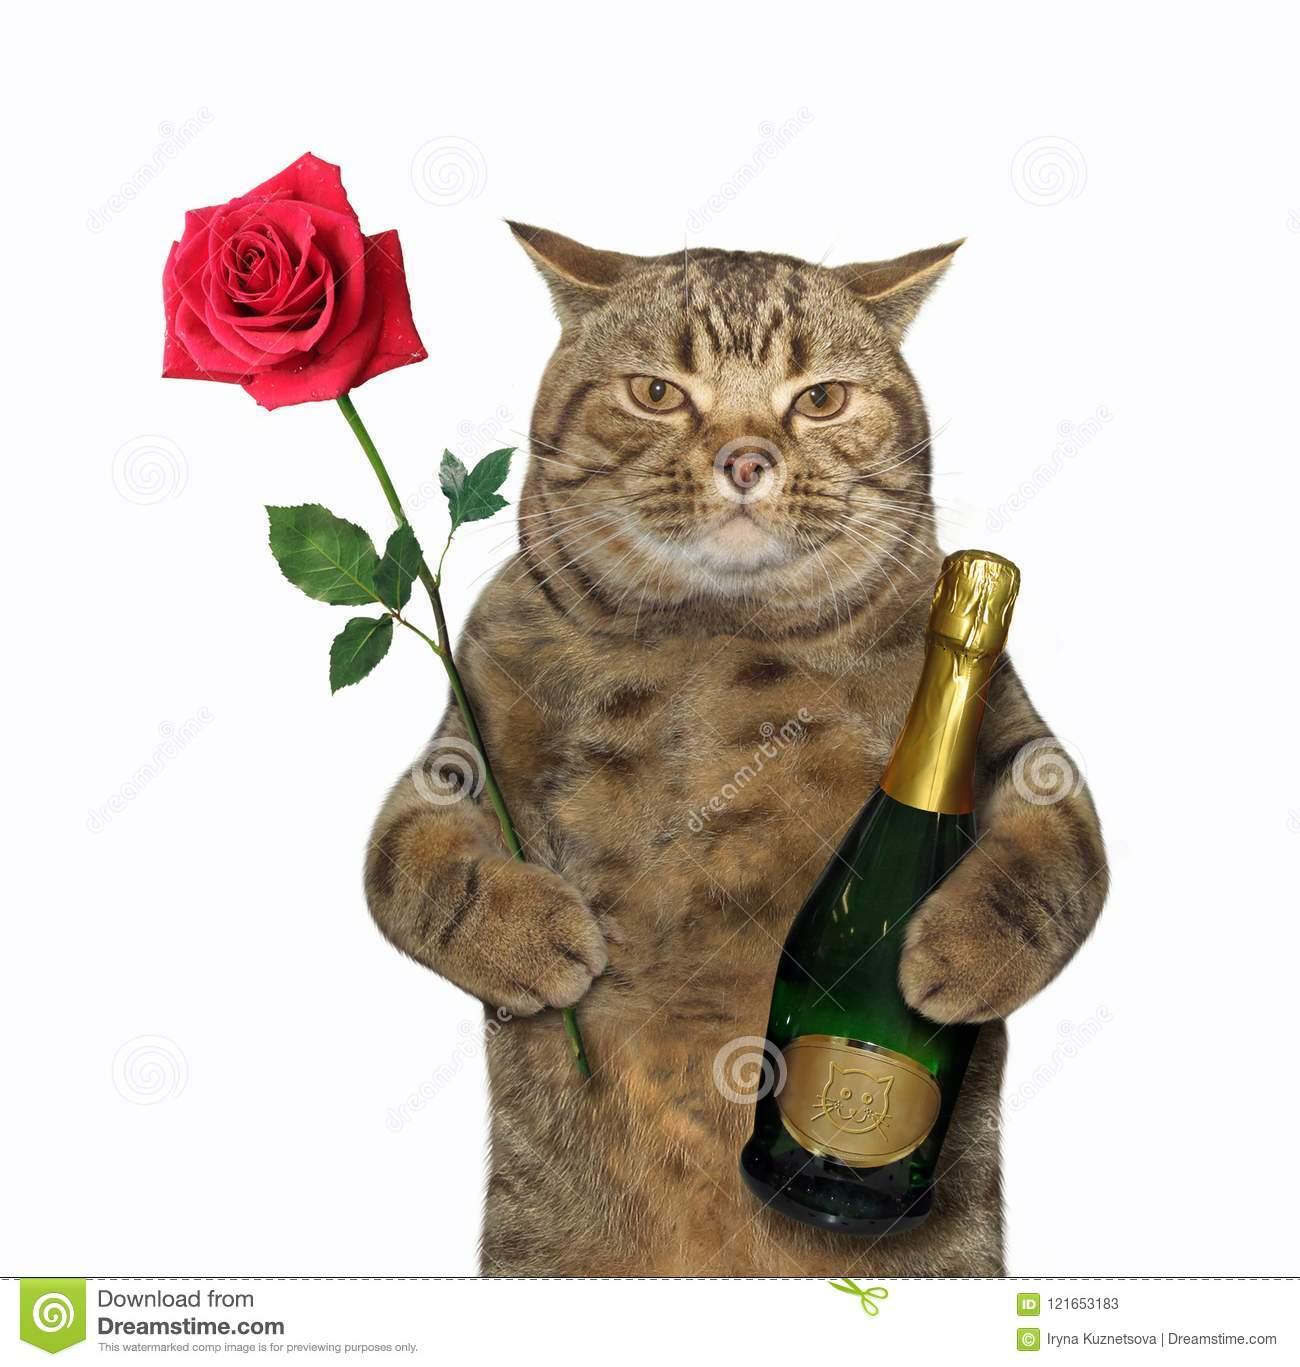 handsome-cat-holds-bottle-sparkling-wine-red-rose-white-background-121653183